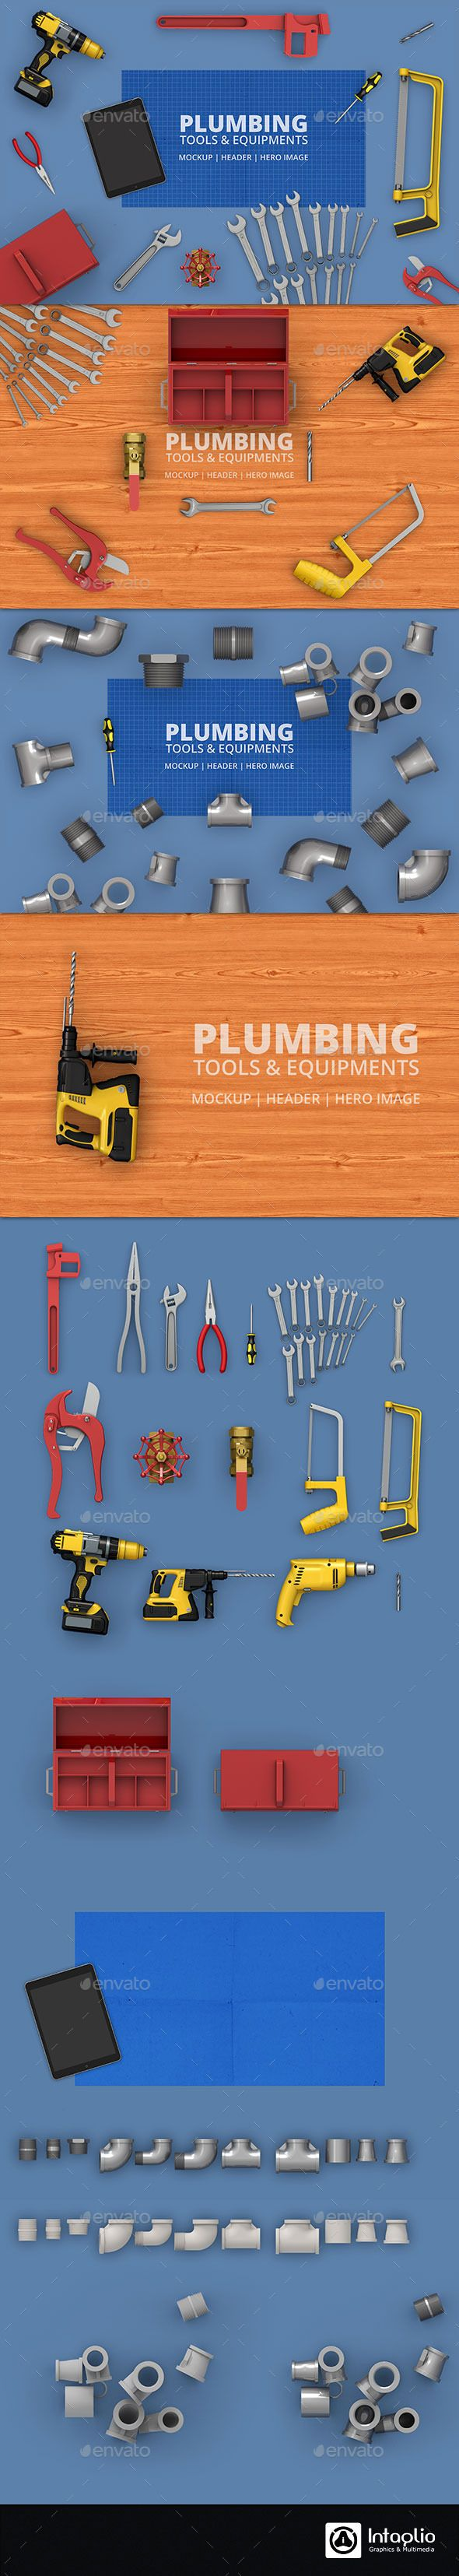 Plumbing Tools & Equipment's Mockup | Hero Image - Hero Images Graphics